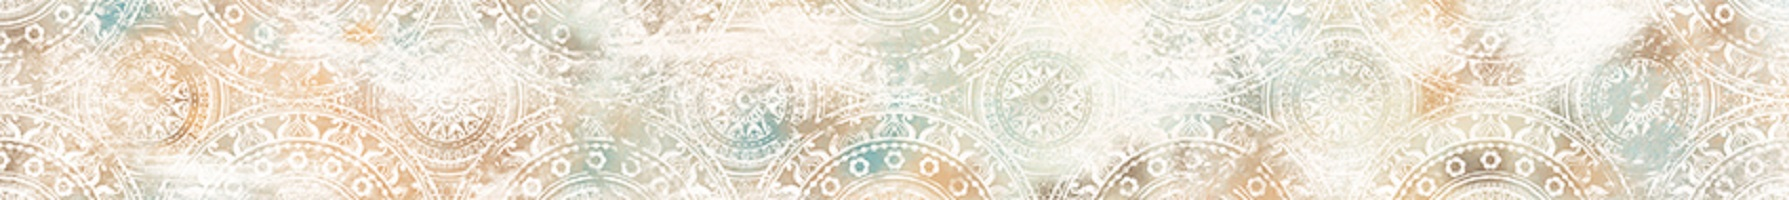 BW0FRS01 Fresco Бордюр 5.8x60